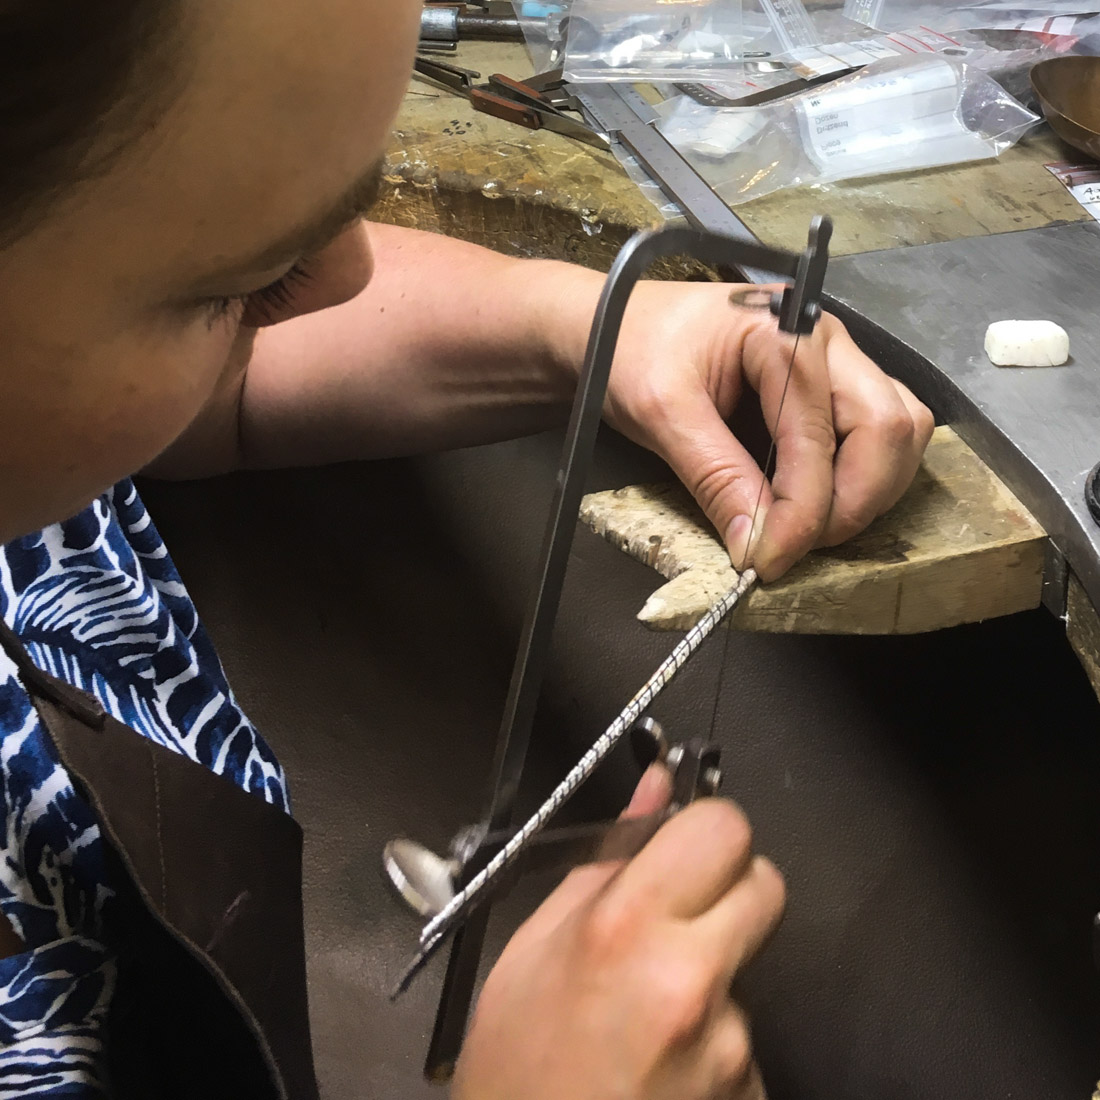 Goldschmiedin arbeitet am Werkbrett